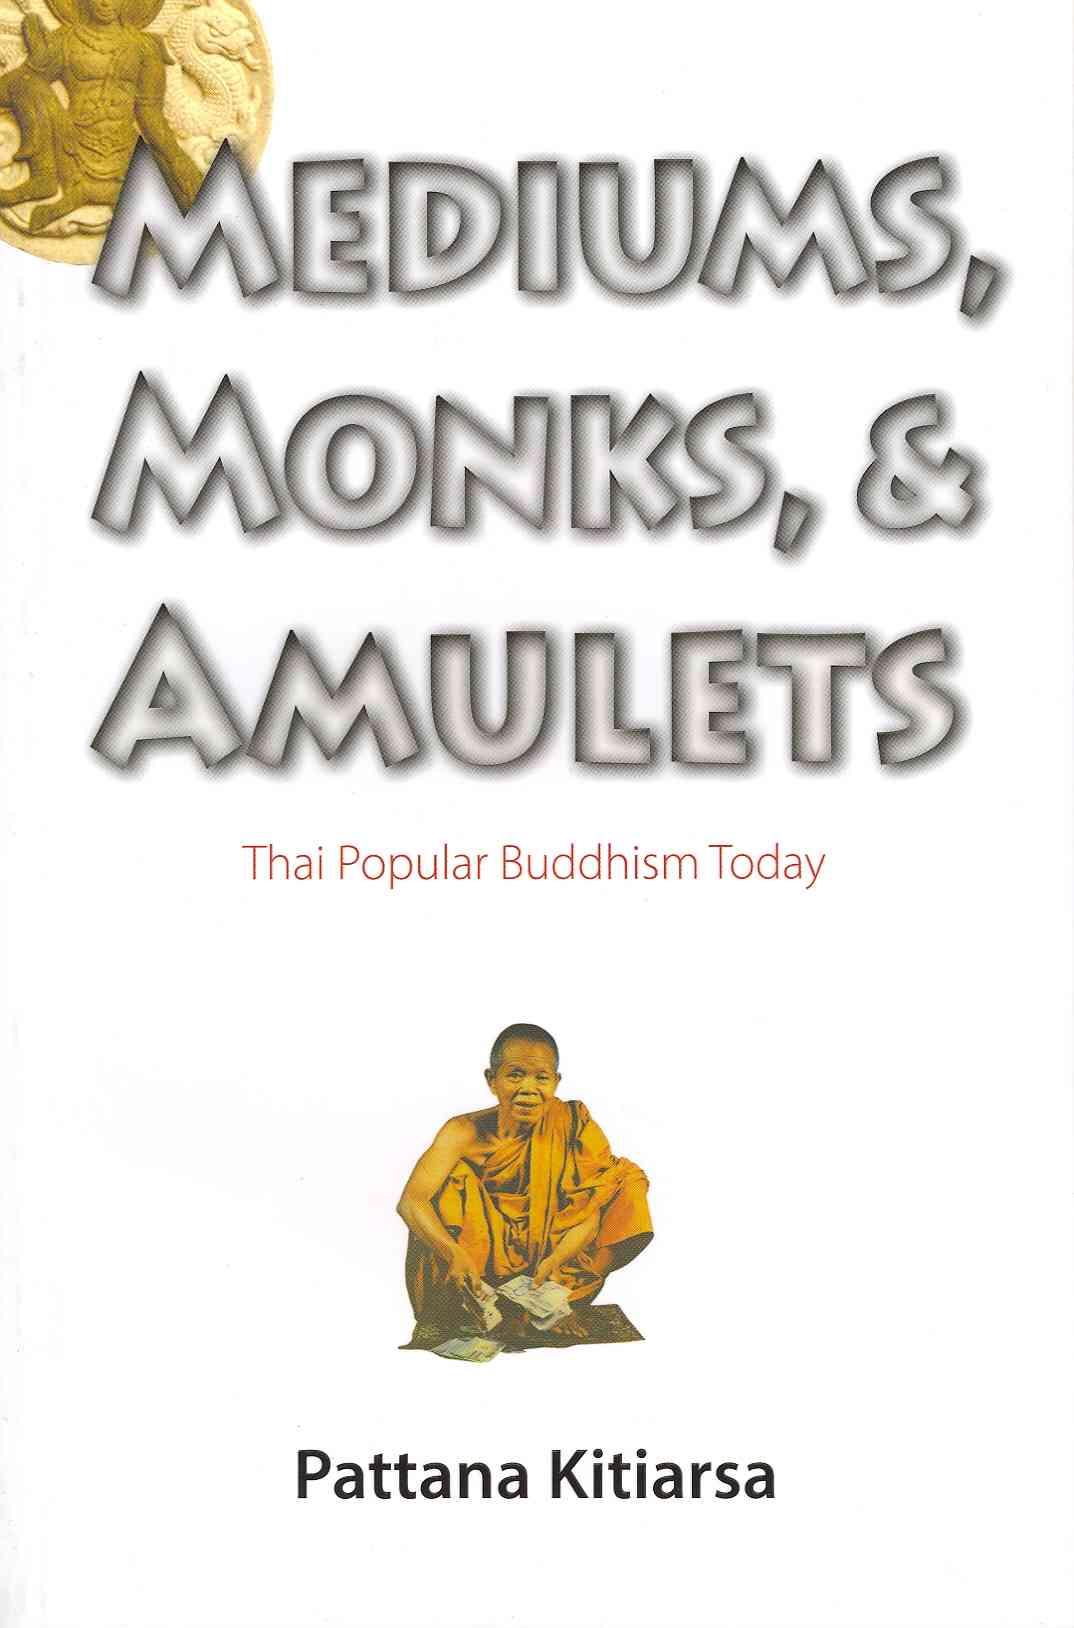 Mediums, Monks, and Amulets By Kitiarasa, Pattana